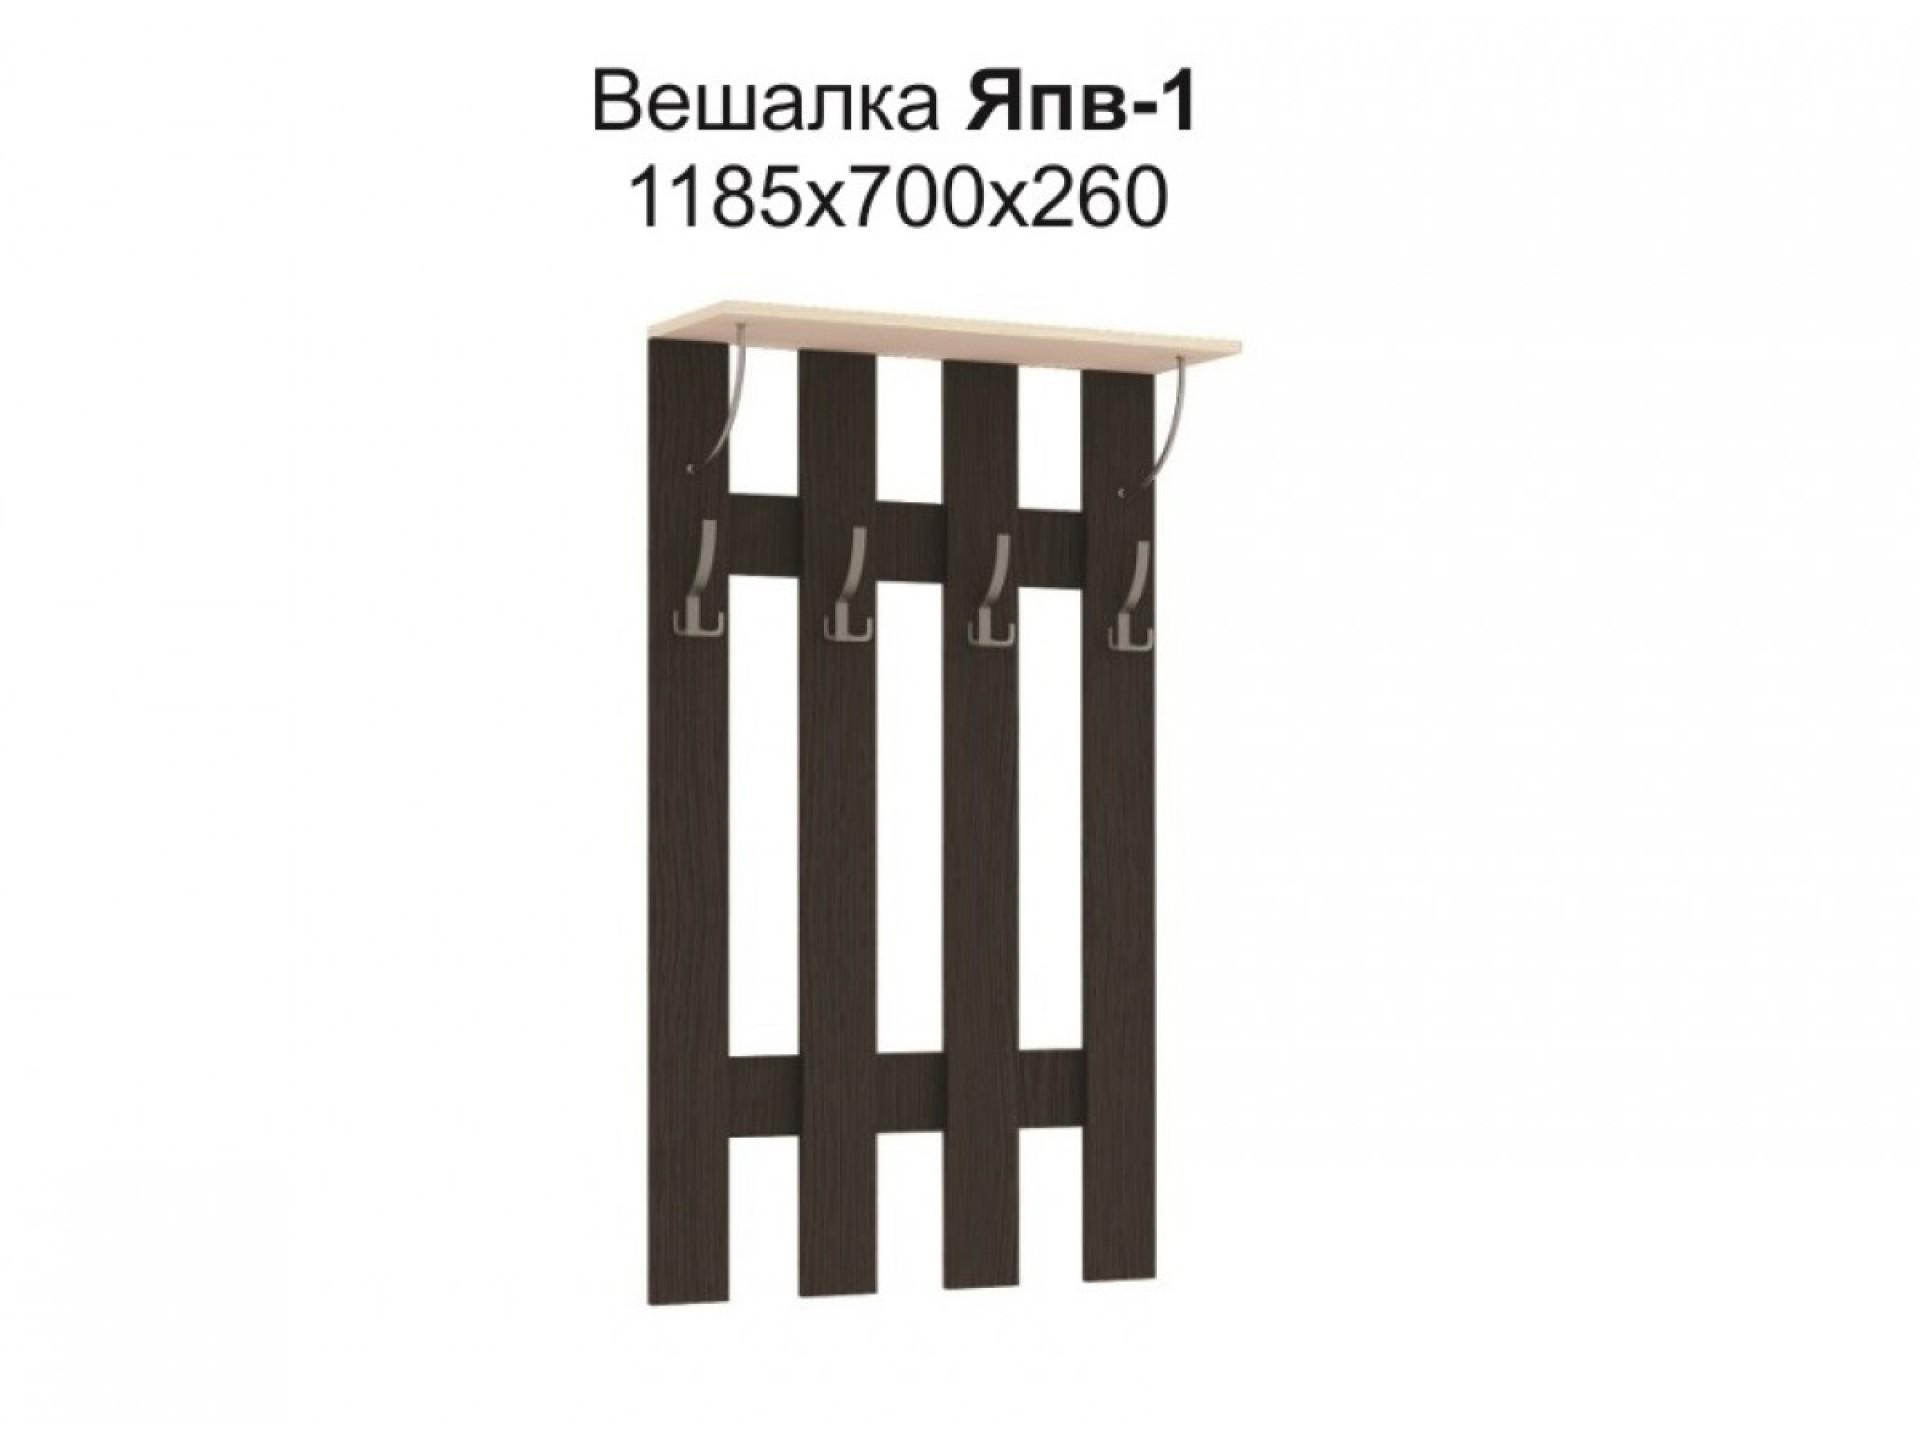 "Вешалка ""Ямайка ЯПВ-1"" приобрести в Томске"